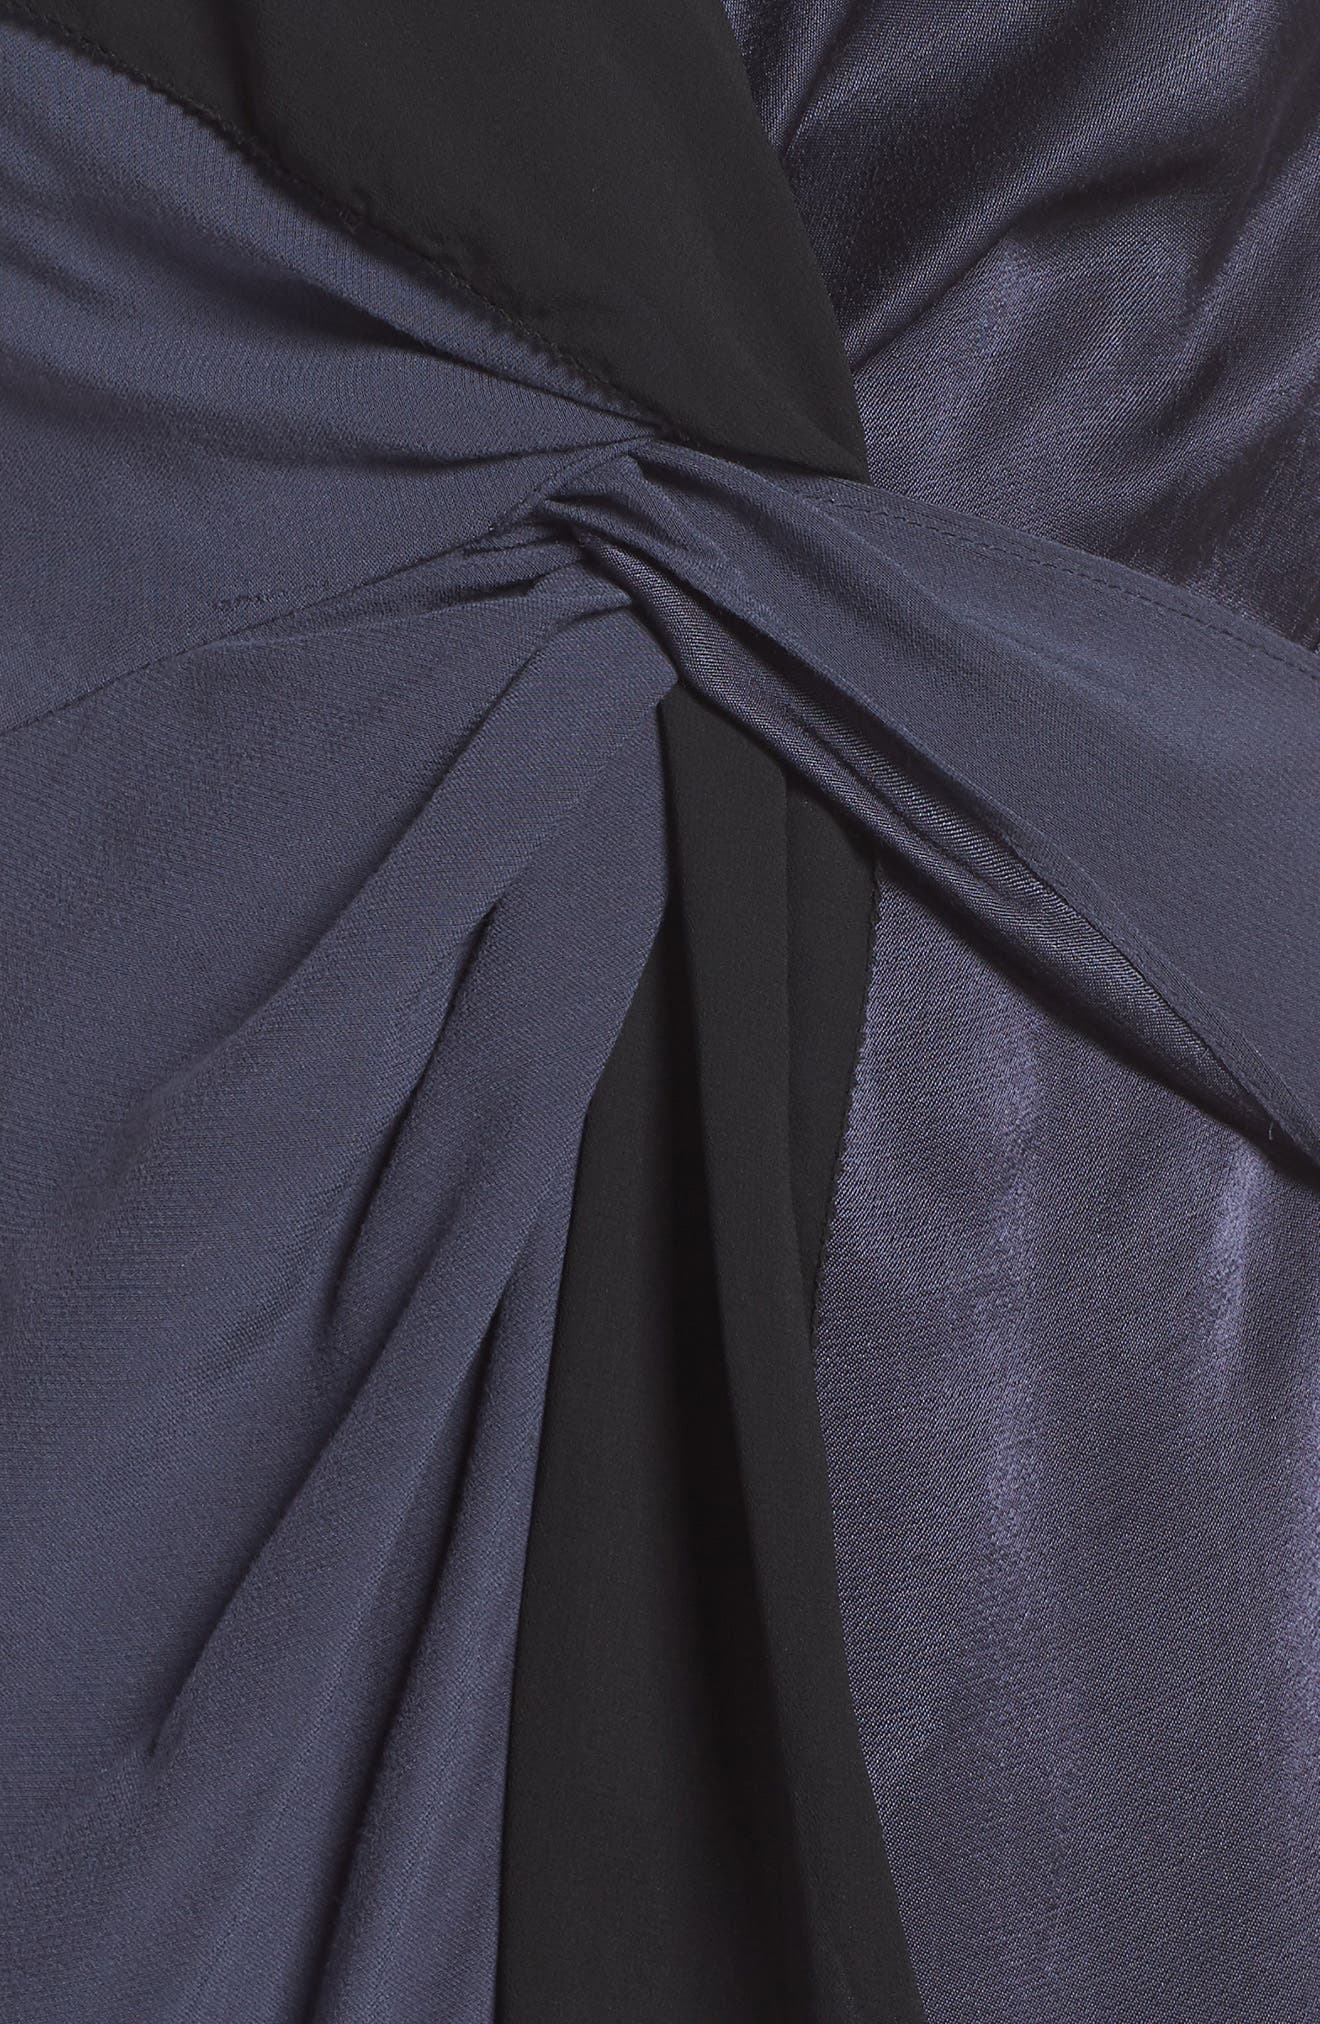 Twist Front Cocktail Dress,                             Alternate thumbnail 6, color,                             BLACK/ NAVY